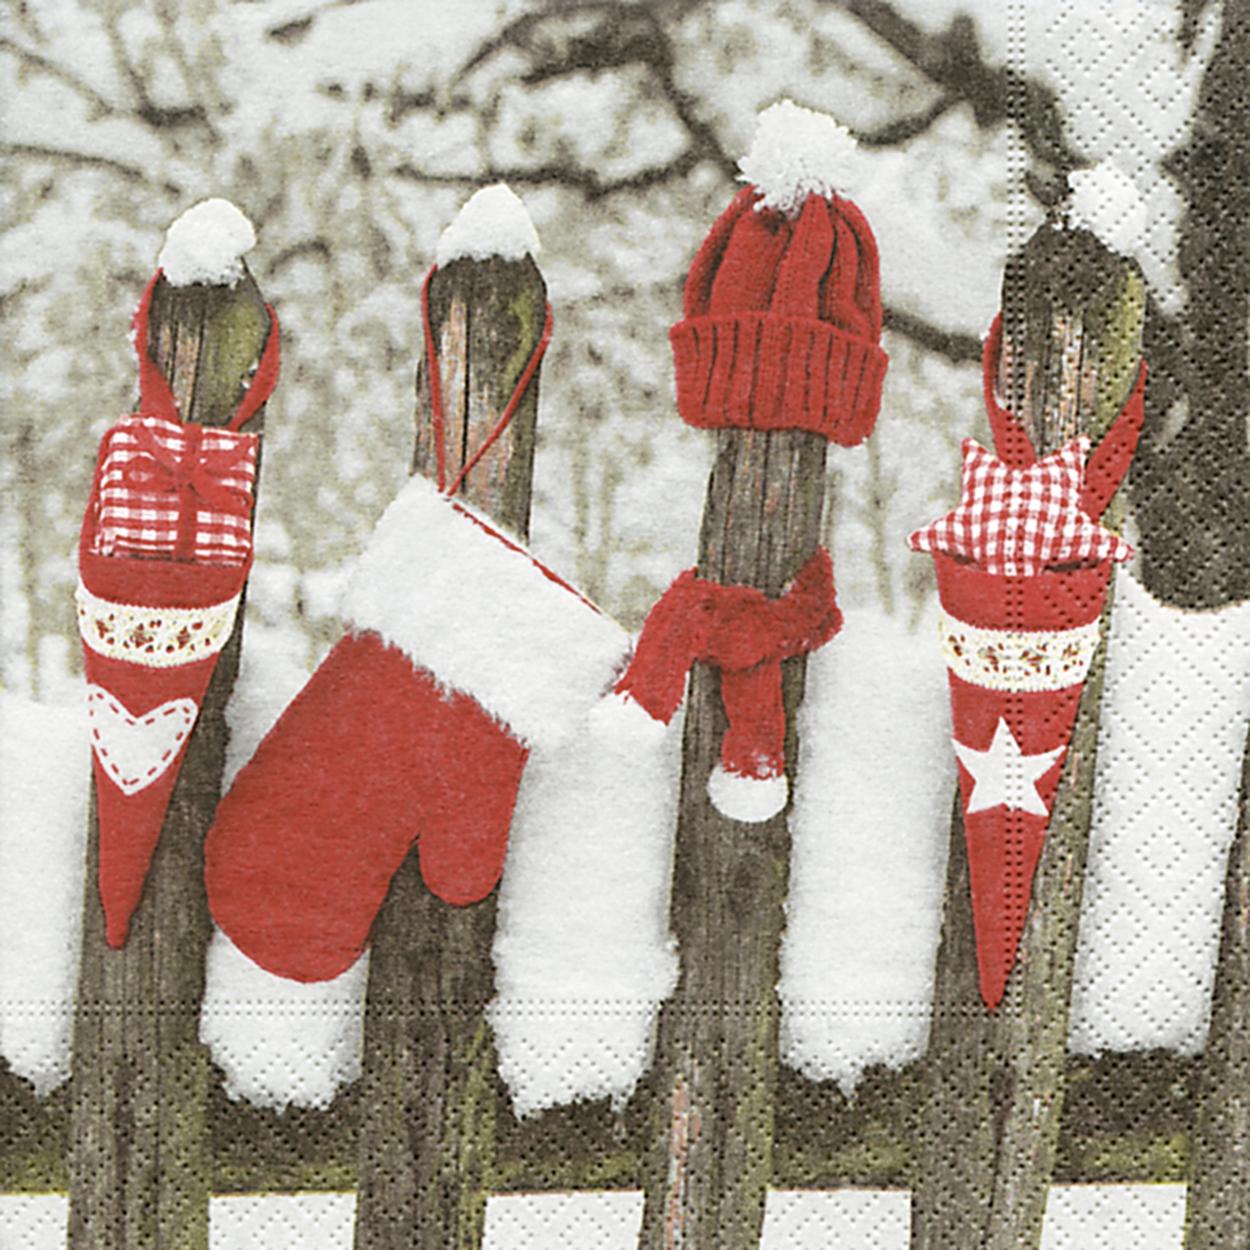 Lunch Servietten Outdoor christmas,  Weihnachten,  lunchservietten,  Zaun,  Handschuhe ,  Mütze